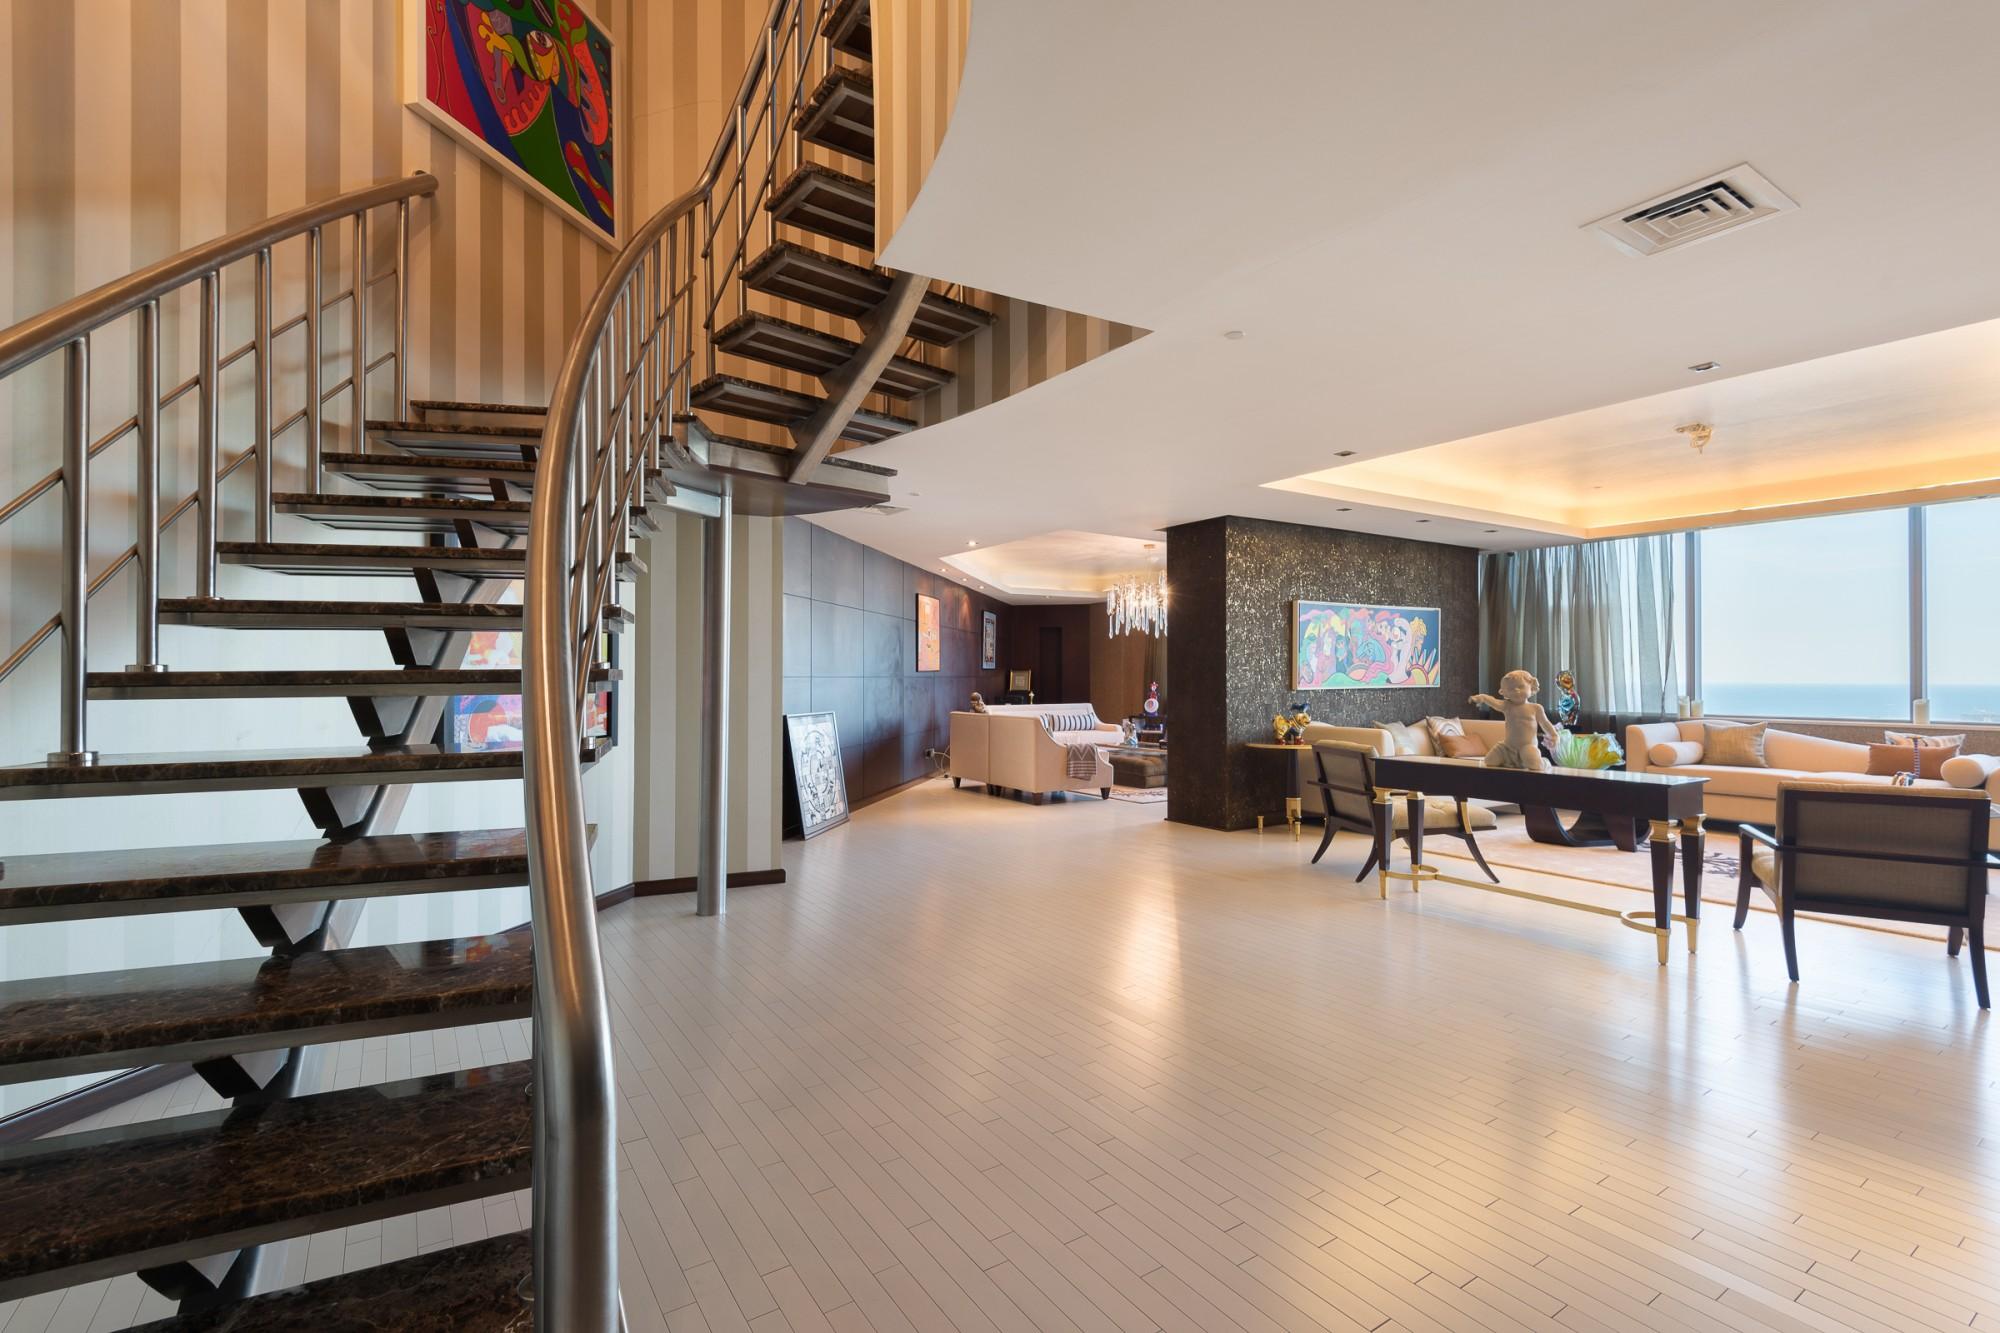 3BR Penthouse | Maximum Privacy & Comfort